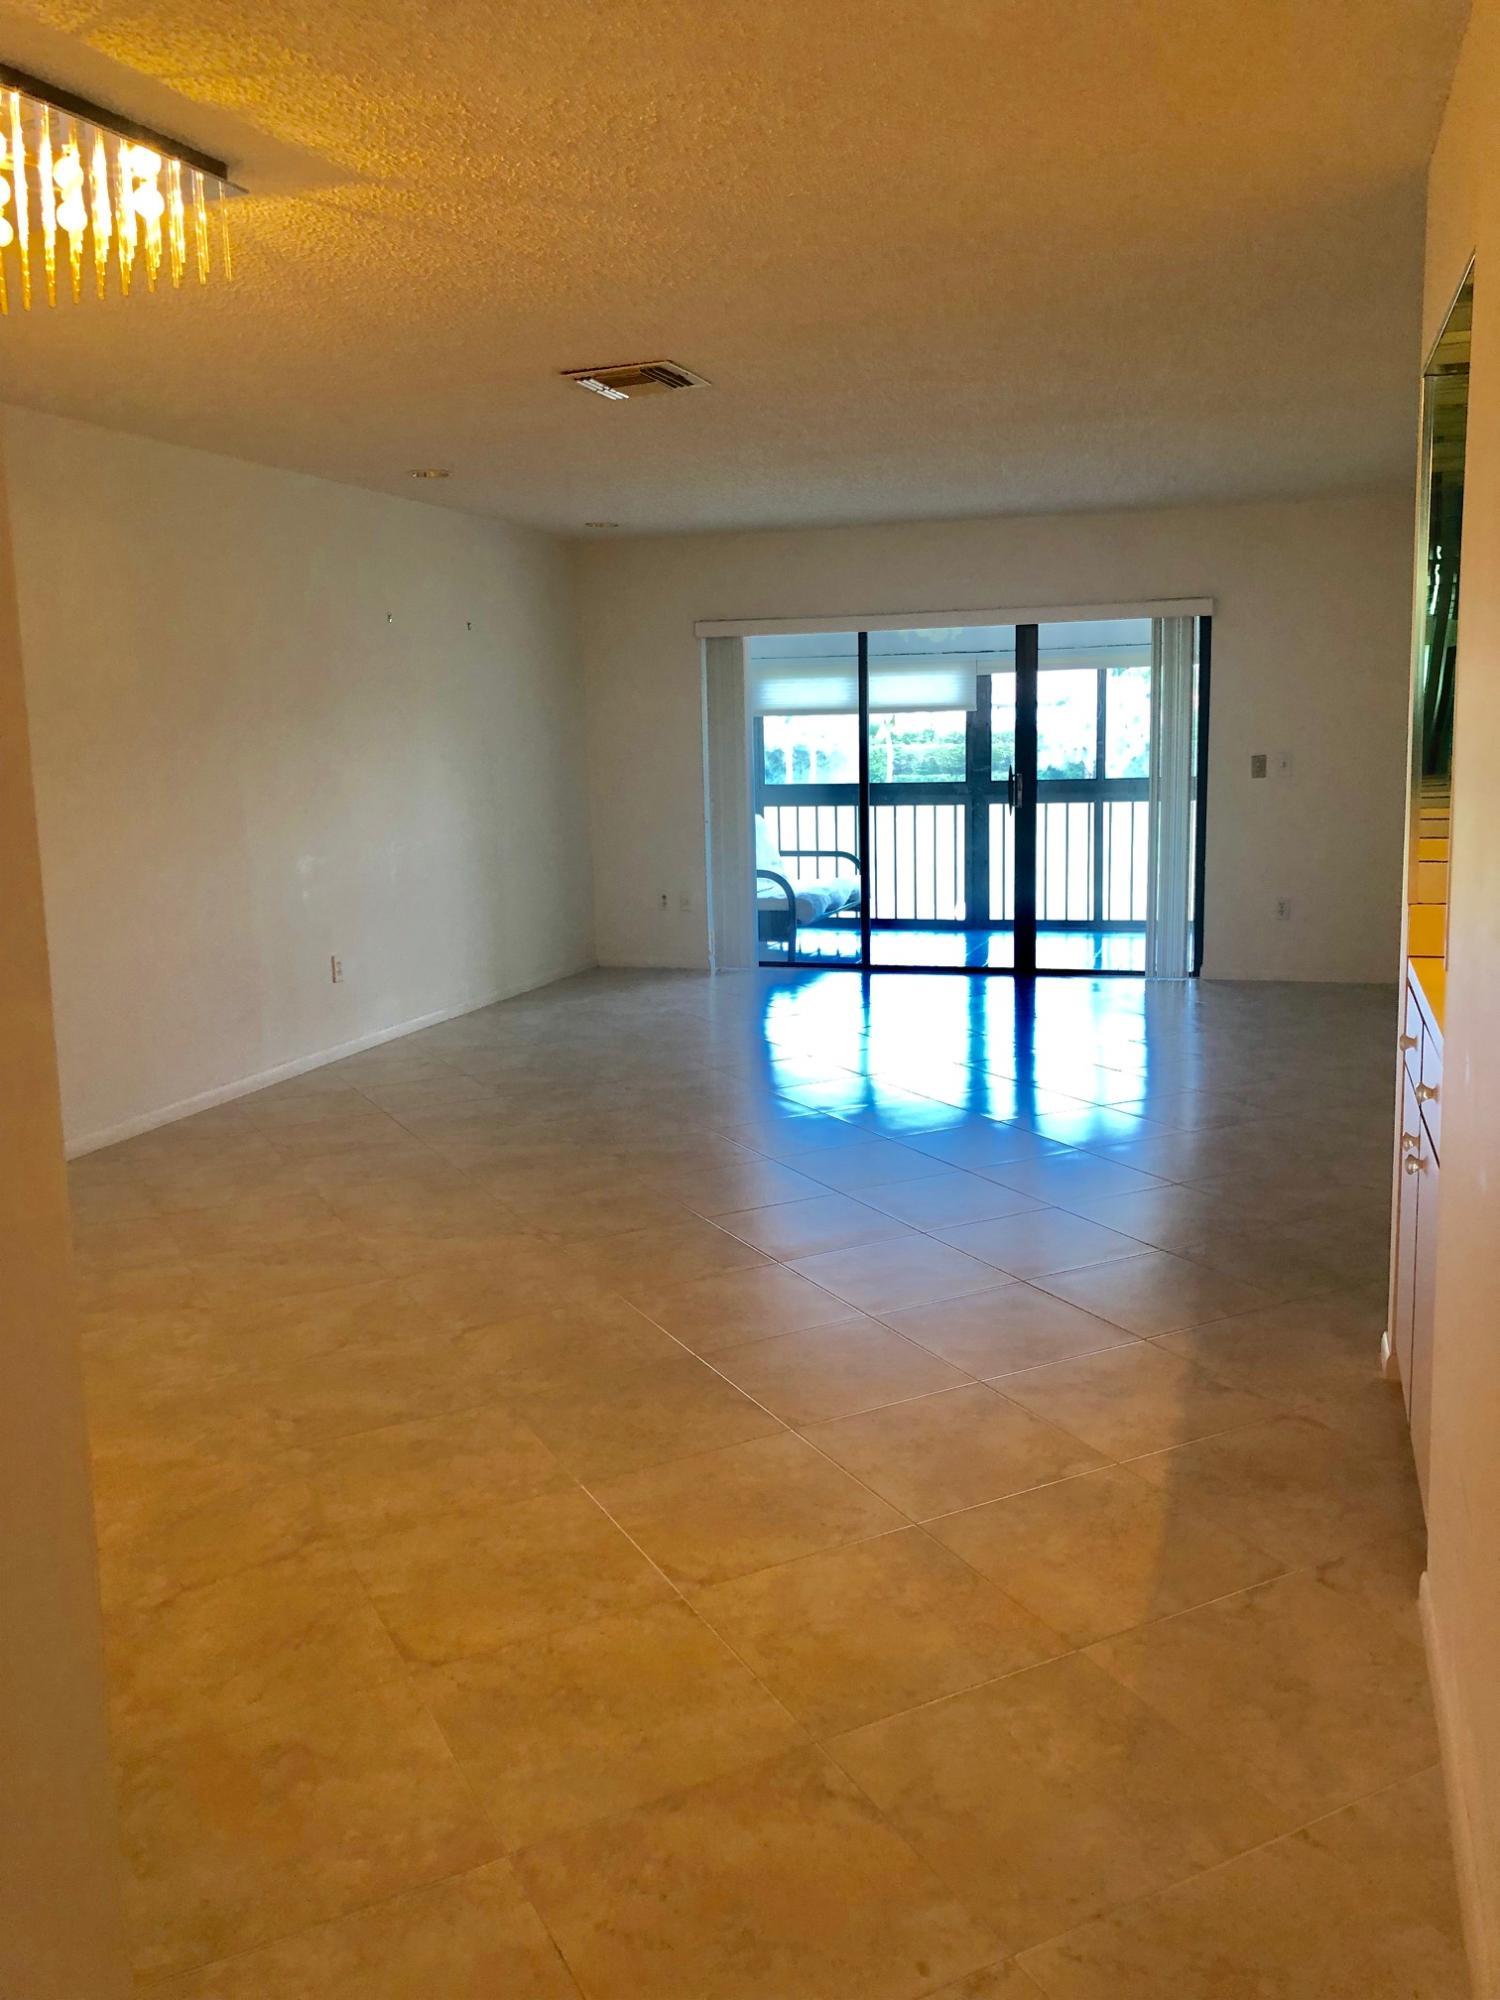 21553 Cypress Hammock Drive Boca Raton FL 33428 - photo 6